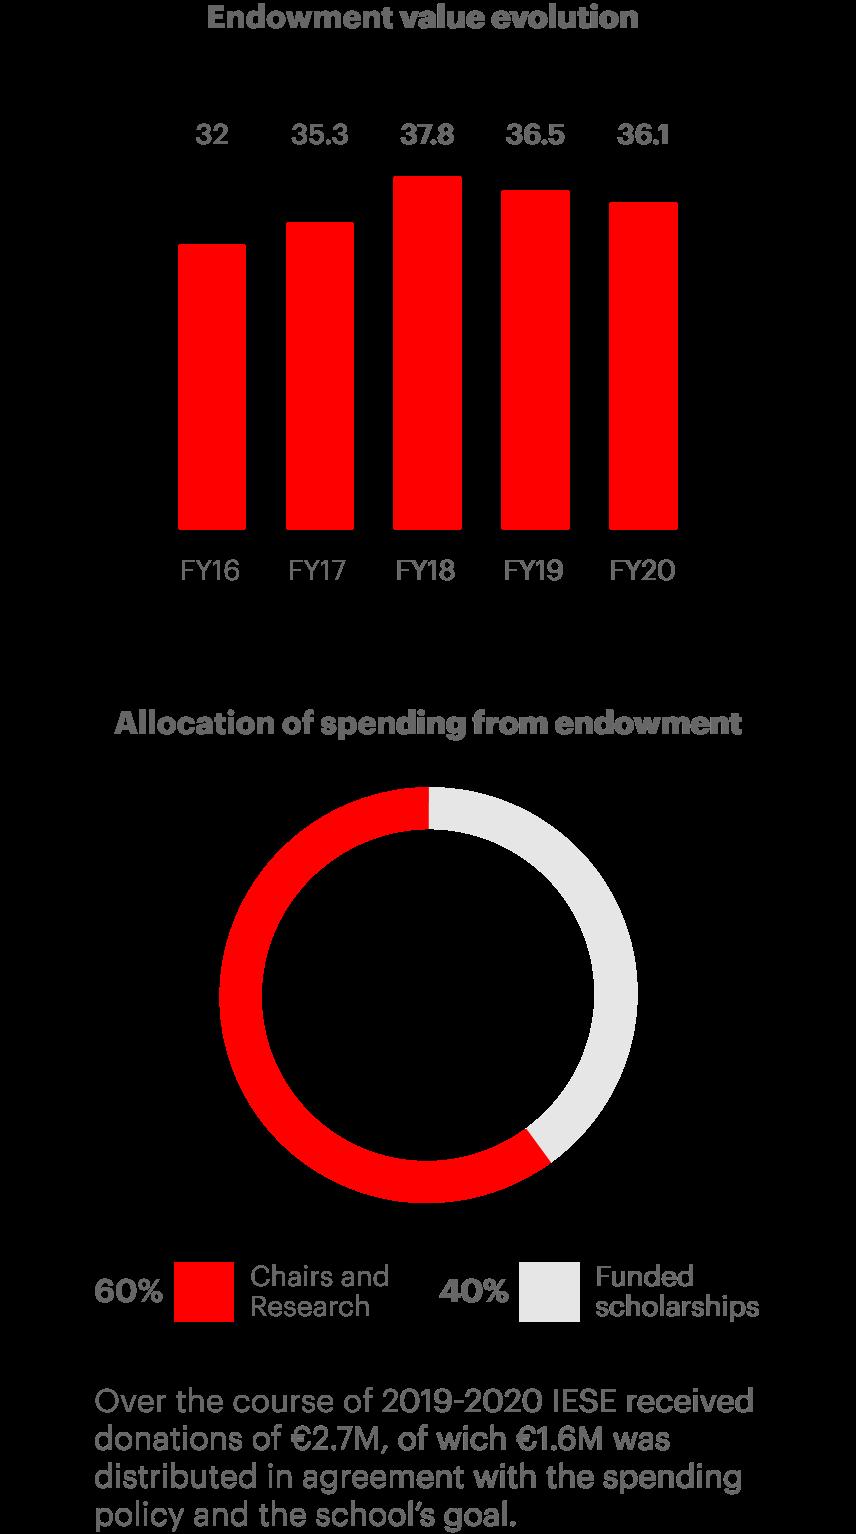 IESE's revenue